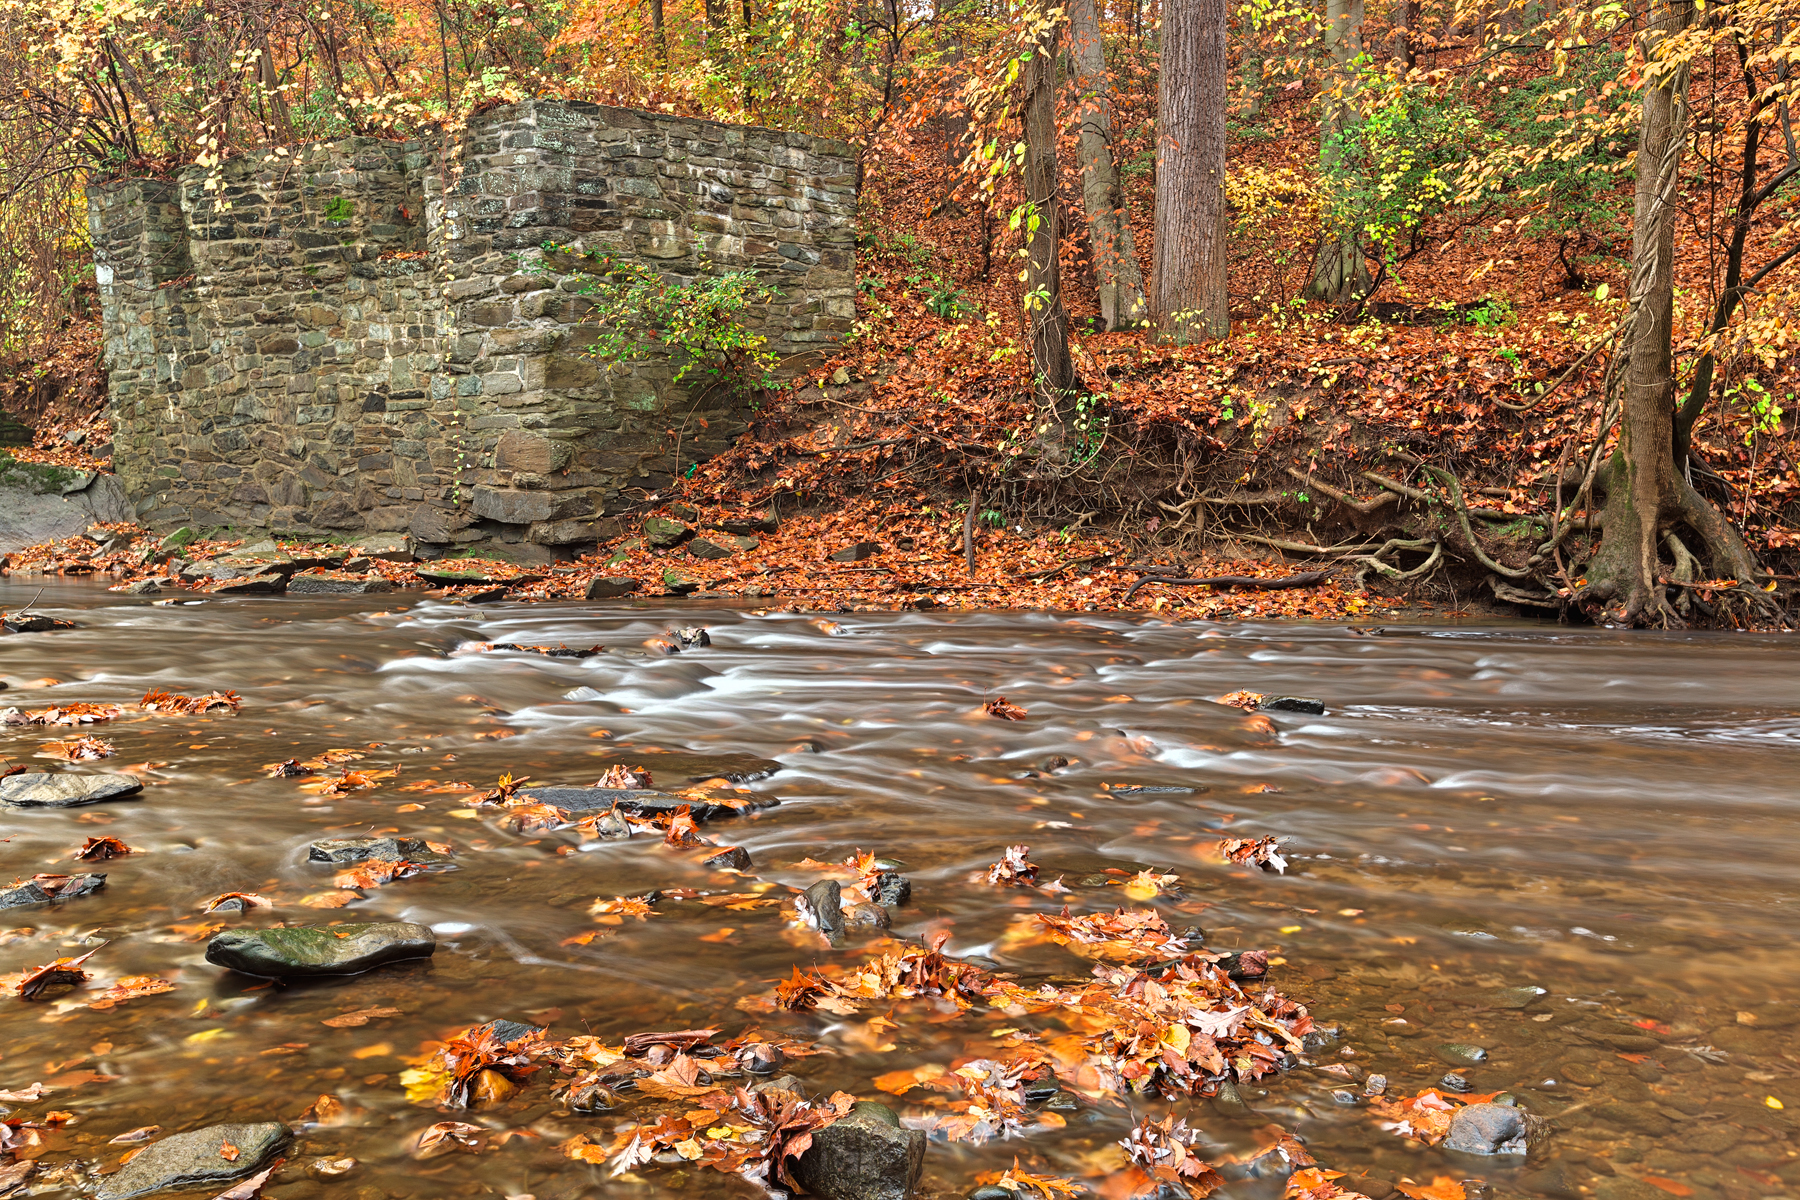 Rustic Fall Creek - HDR, Age, Park, Scenic, Scenery, HQ Photo